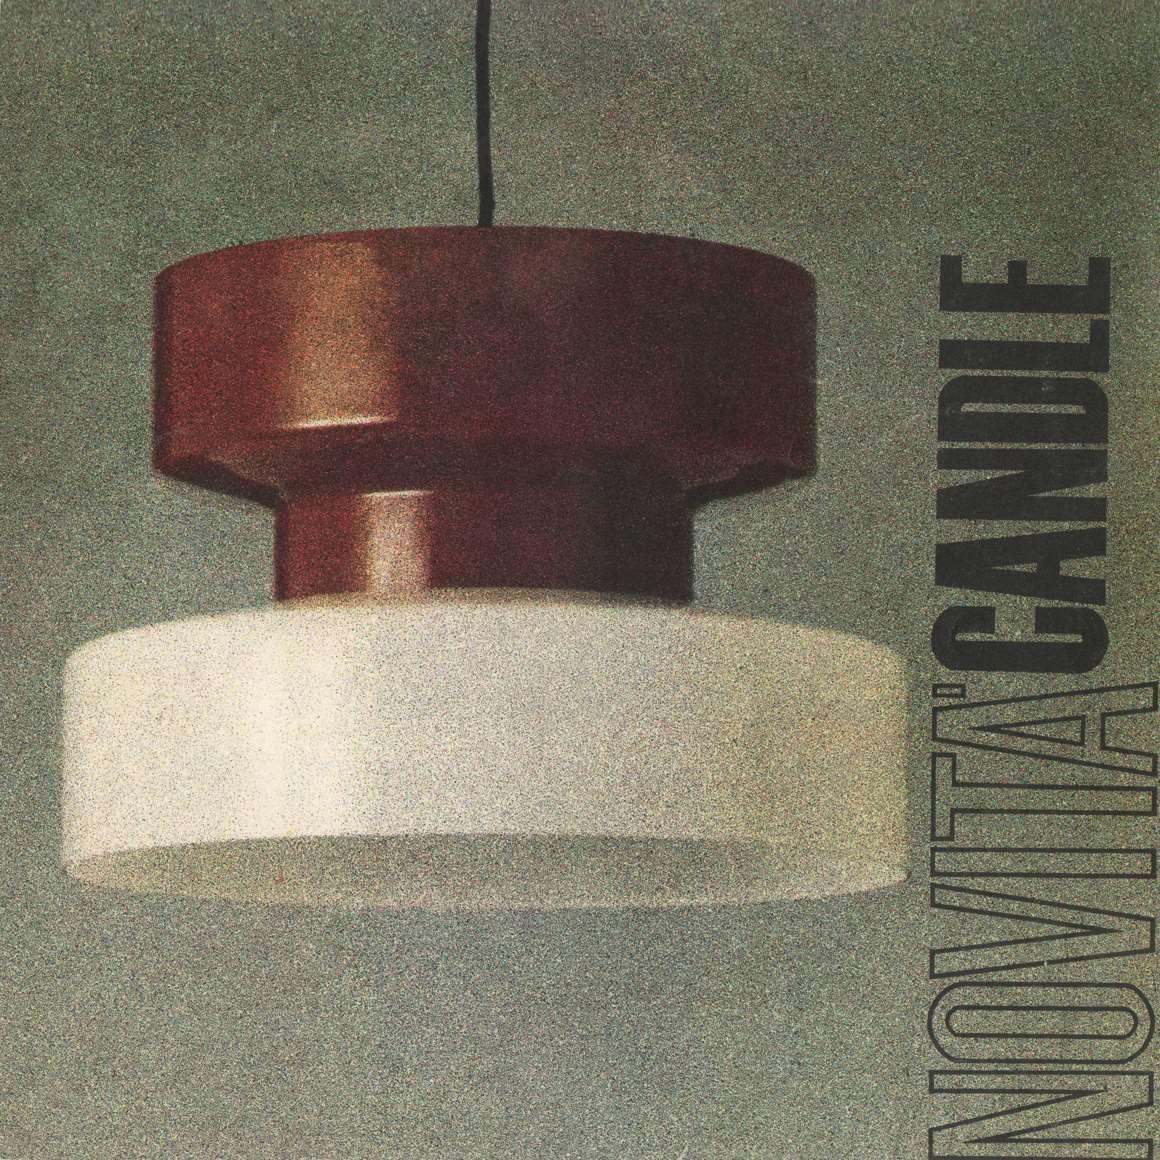 Candle 1960s Lighting Catalogue – Vintage Pendant Lamps, Floor Lamps, Table Lamps, Desk Lamps Chandeliers, Wall Lamps